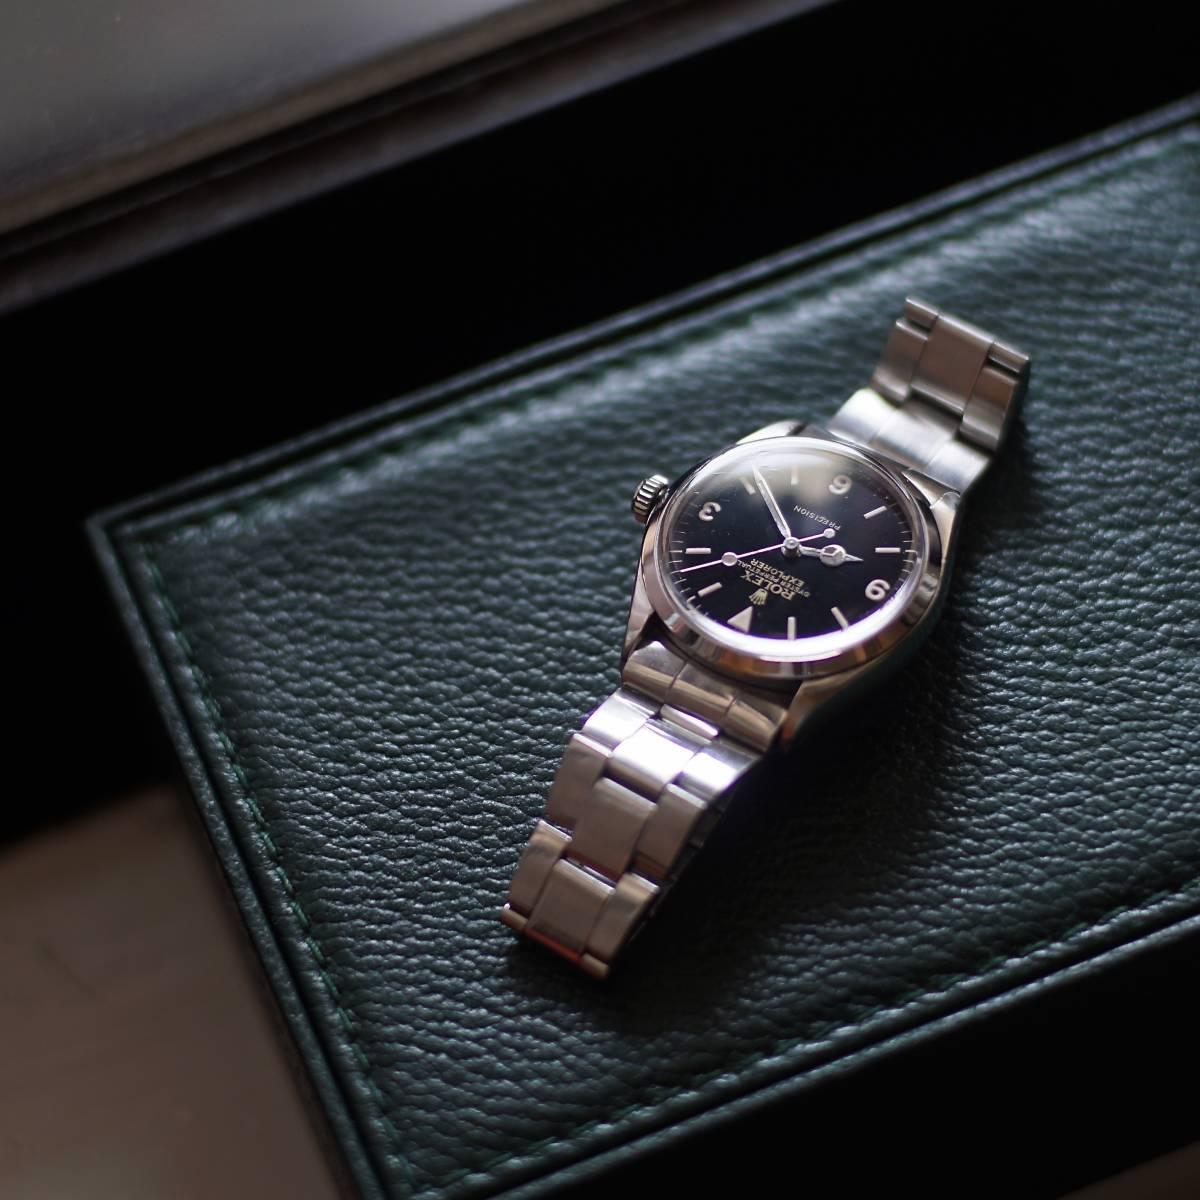 timeless design b9bbc 77cac 美品 OH済 Rolex 5500 Explorer ミラー文字盤 (ロレックス ...